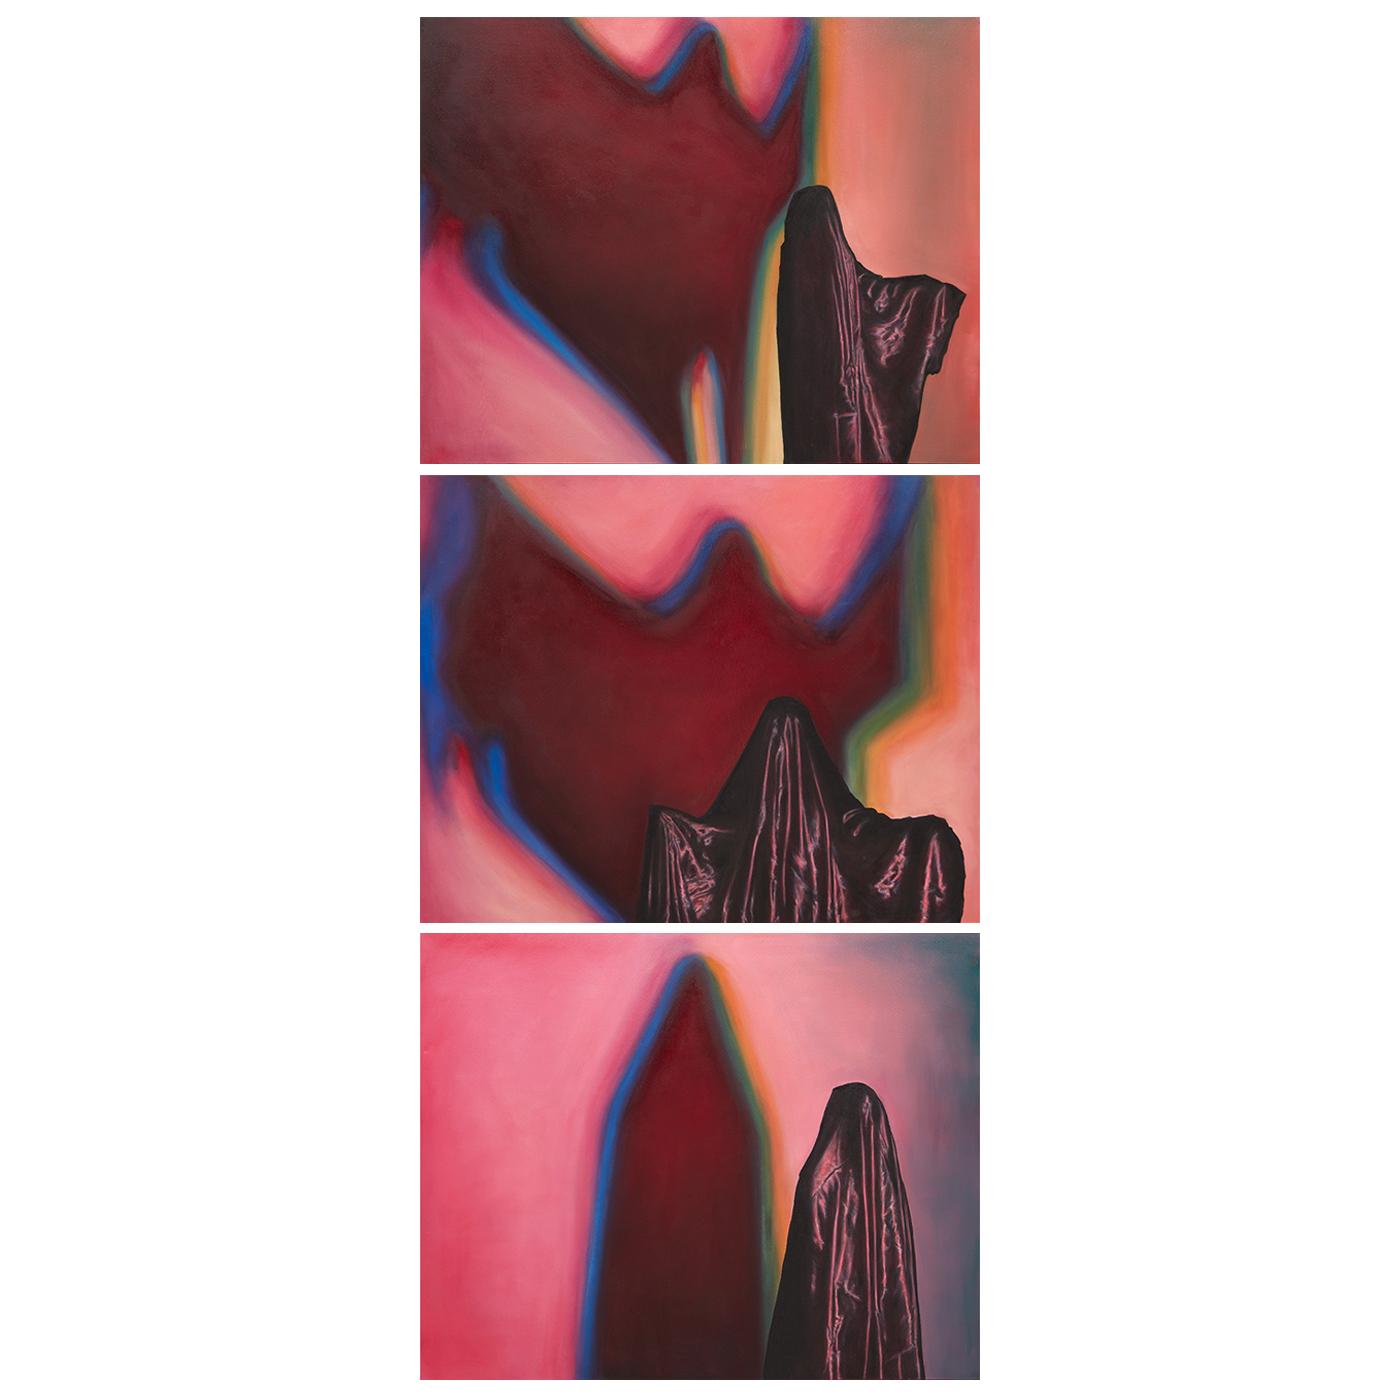 Iman A. Bhatti - Under the Veil